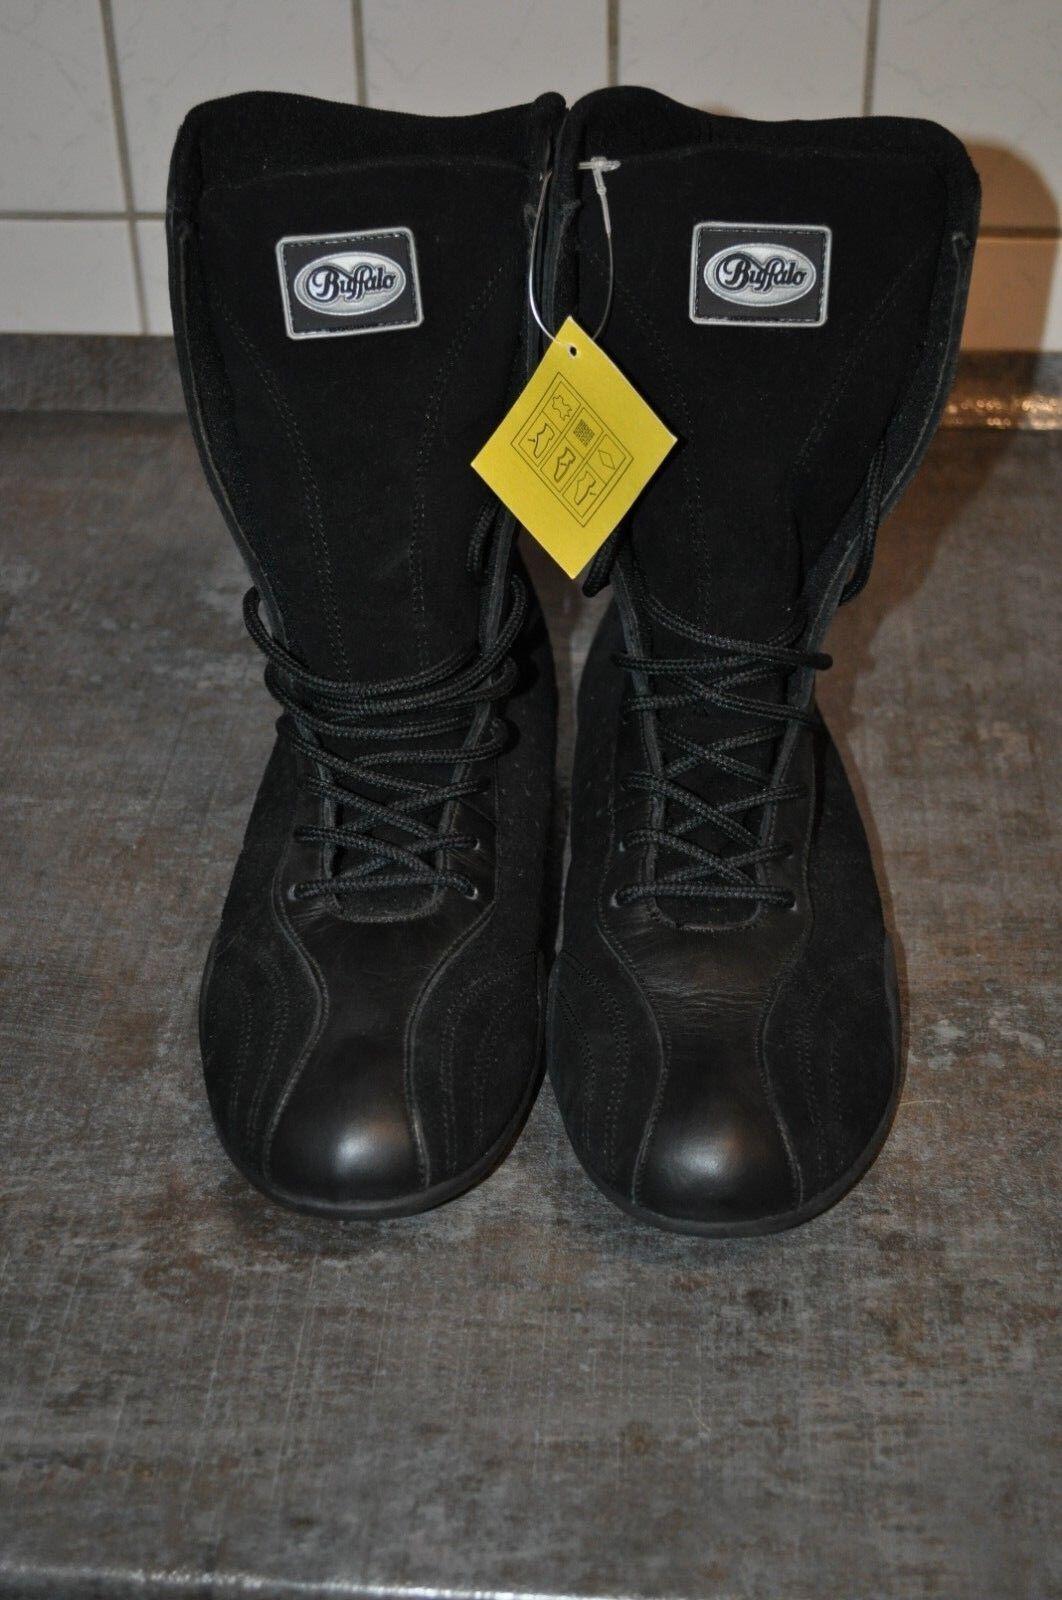 Buffalo High Top Stiefel Farbe schwarz schwarz schwarz Gr 41 ebedb8